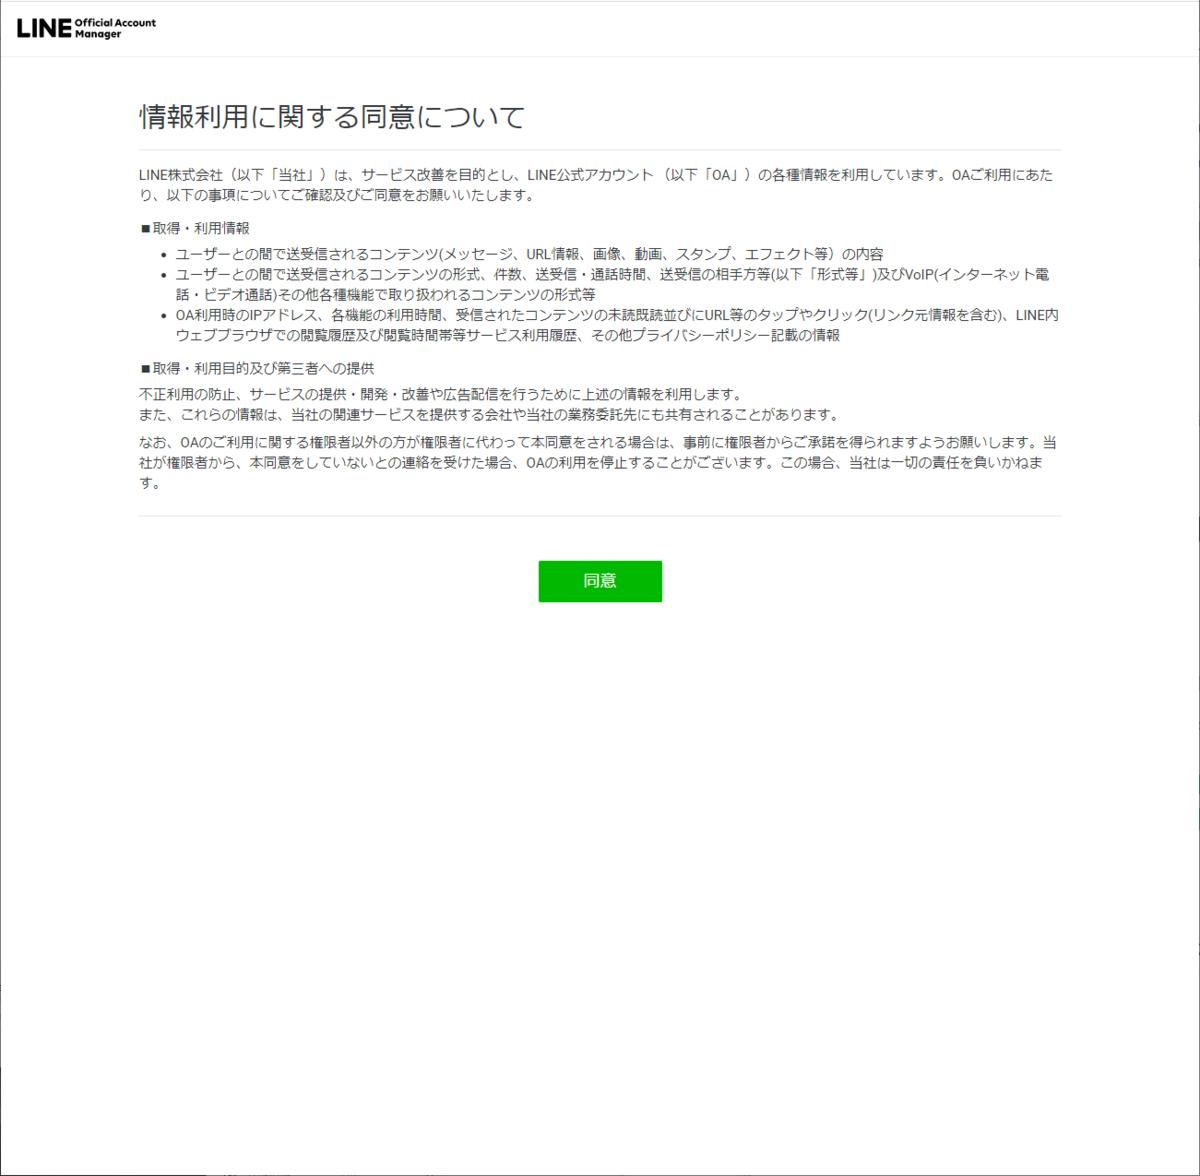 f:id:tsu--kun:20201214074339p:plain